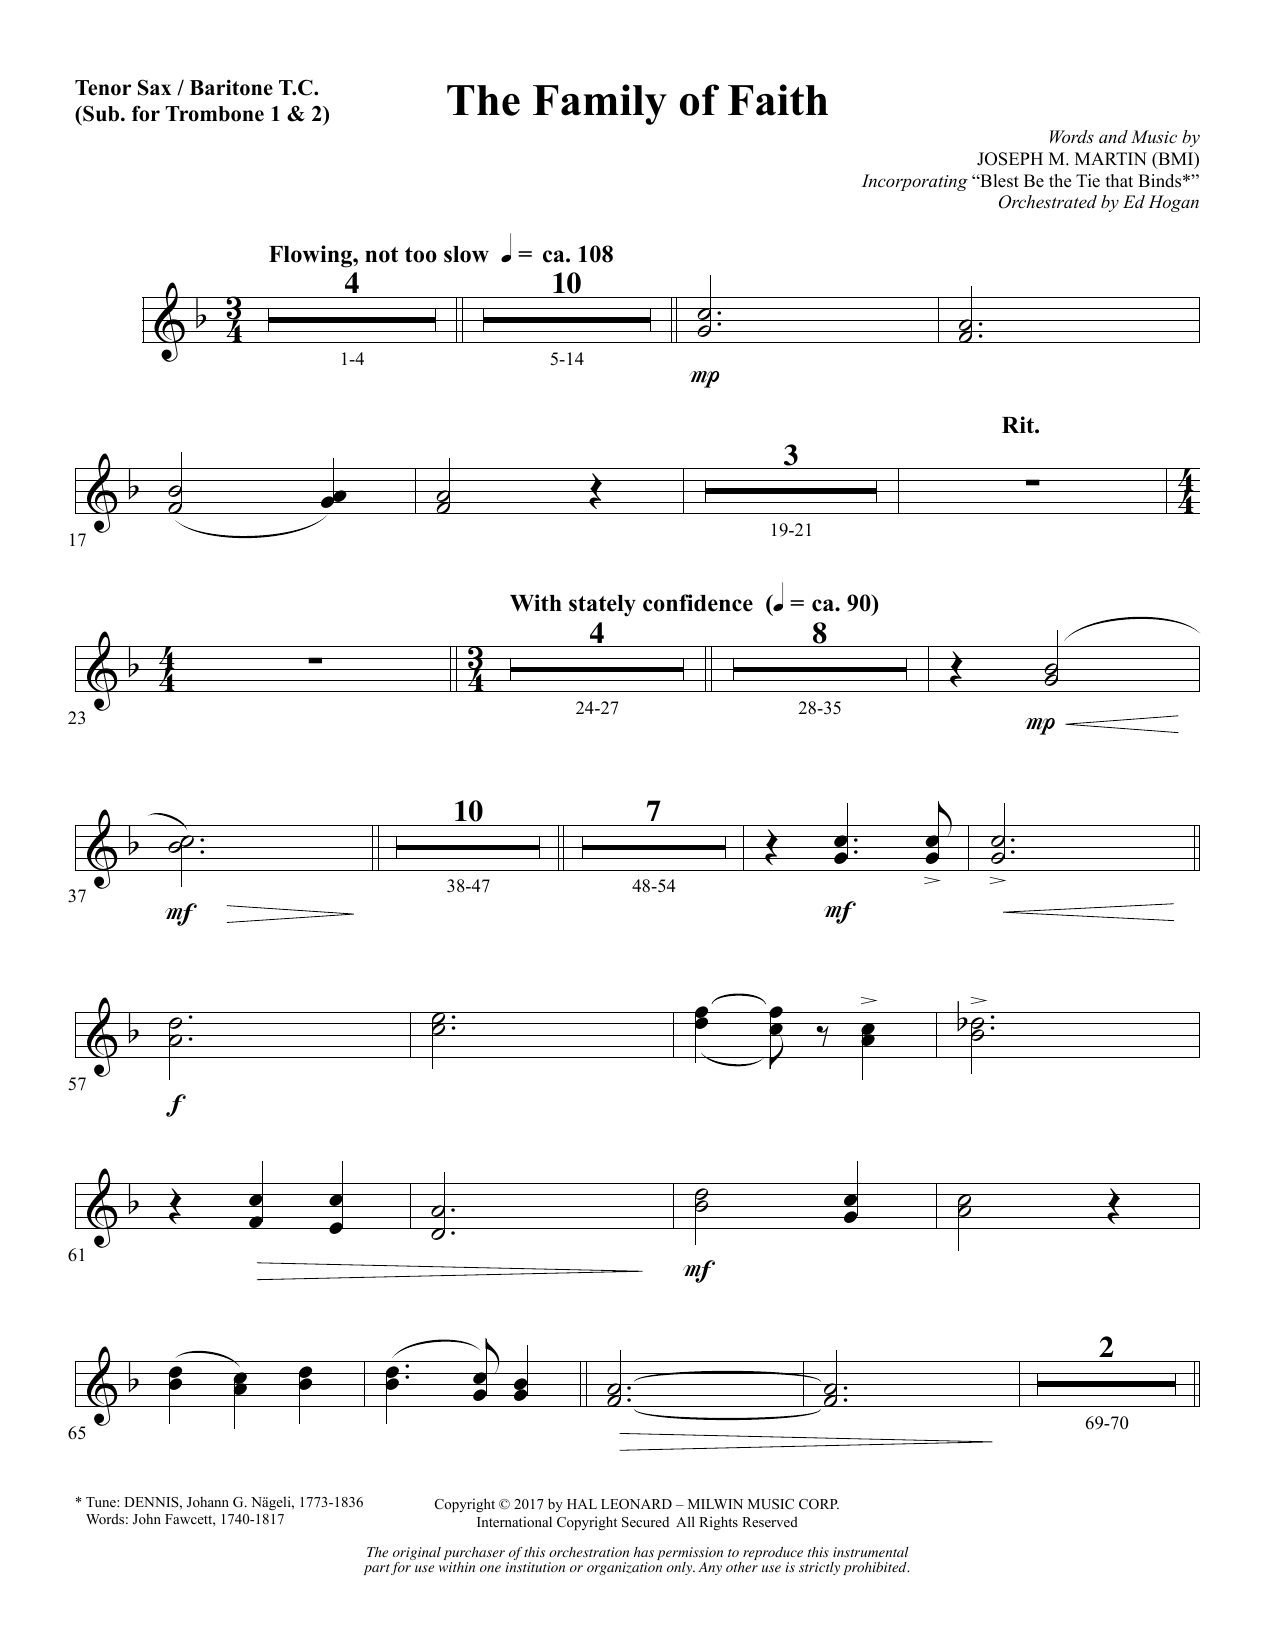 The Family of Faith - Tenor Sax/BariTC (sub Tbn 1-2) (Choir Instrumental Pak)